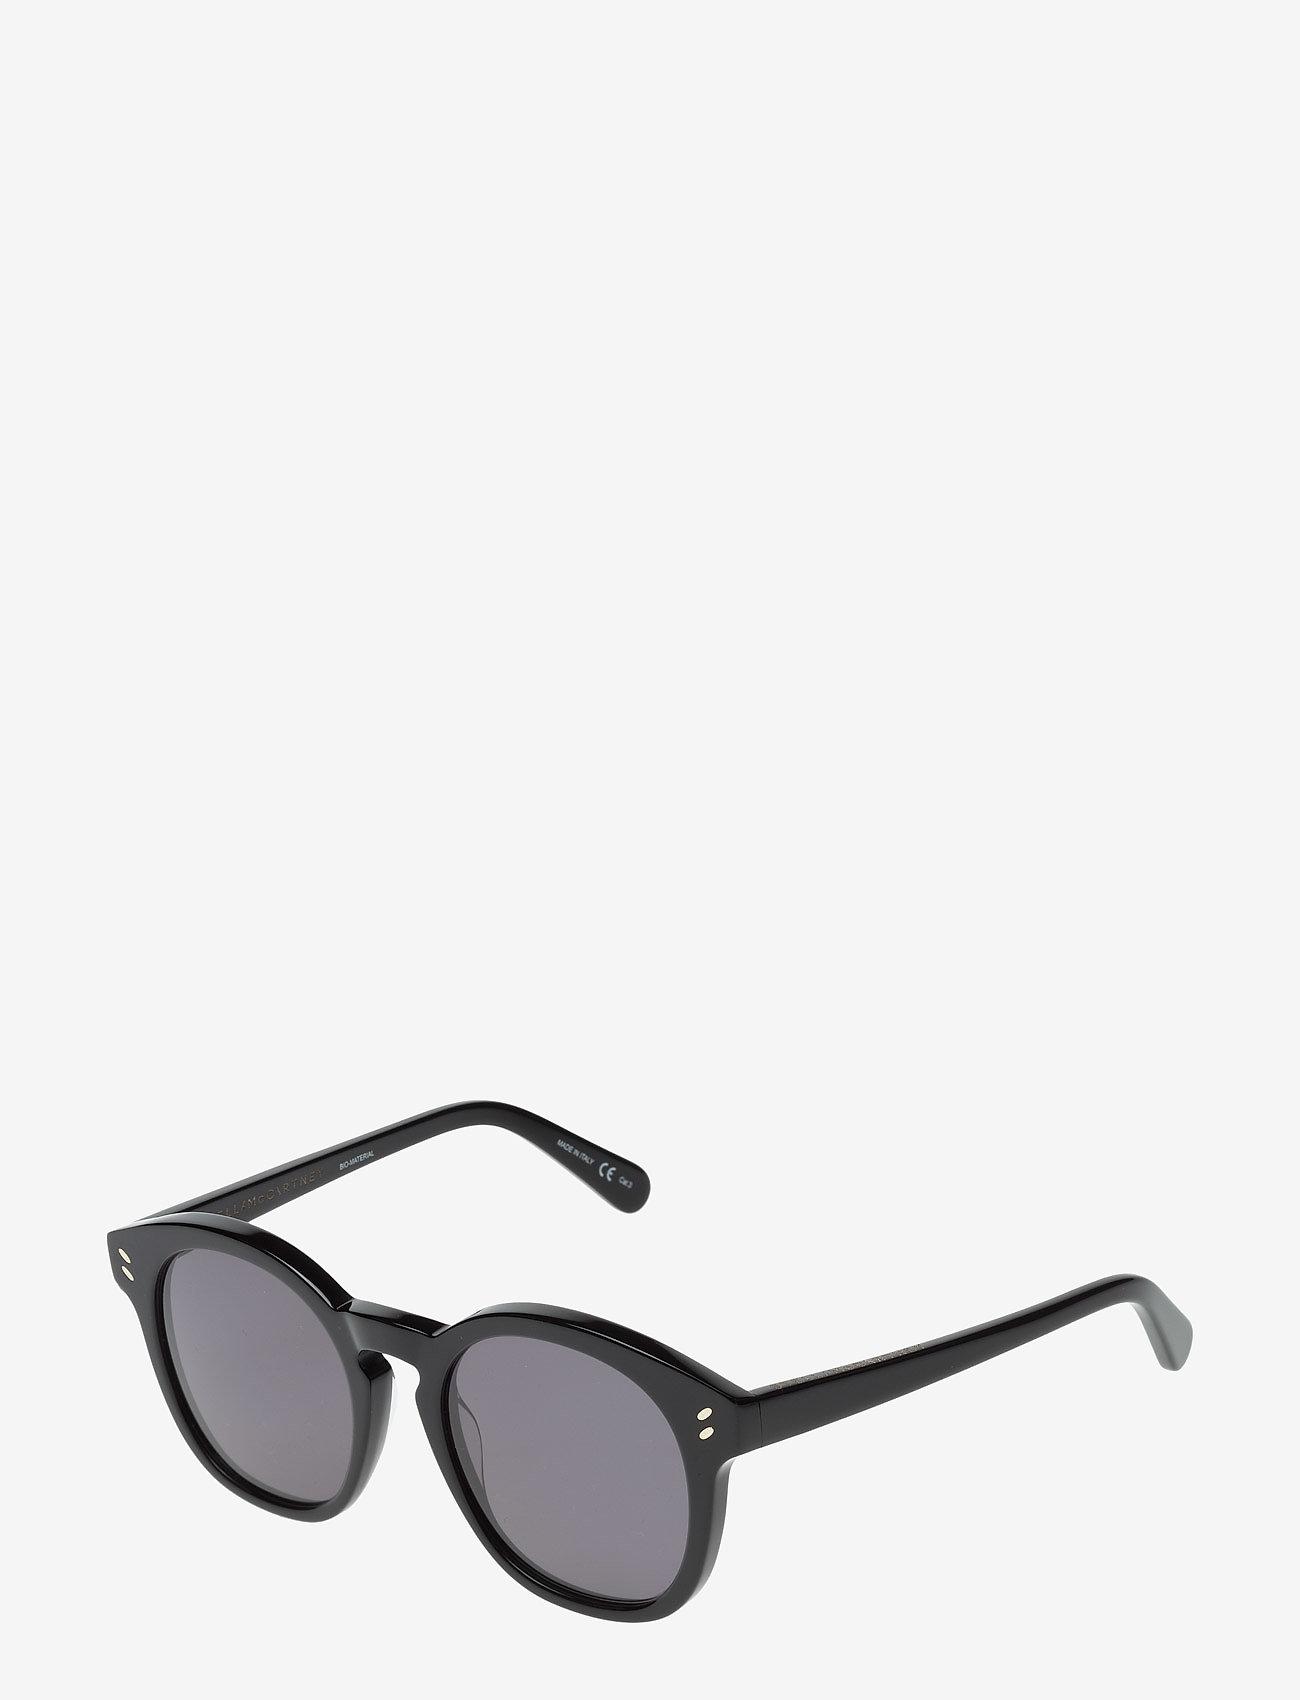 Stella McCartney Eyewear - SC0013S - rond model - black-black-grey - 1